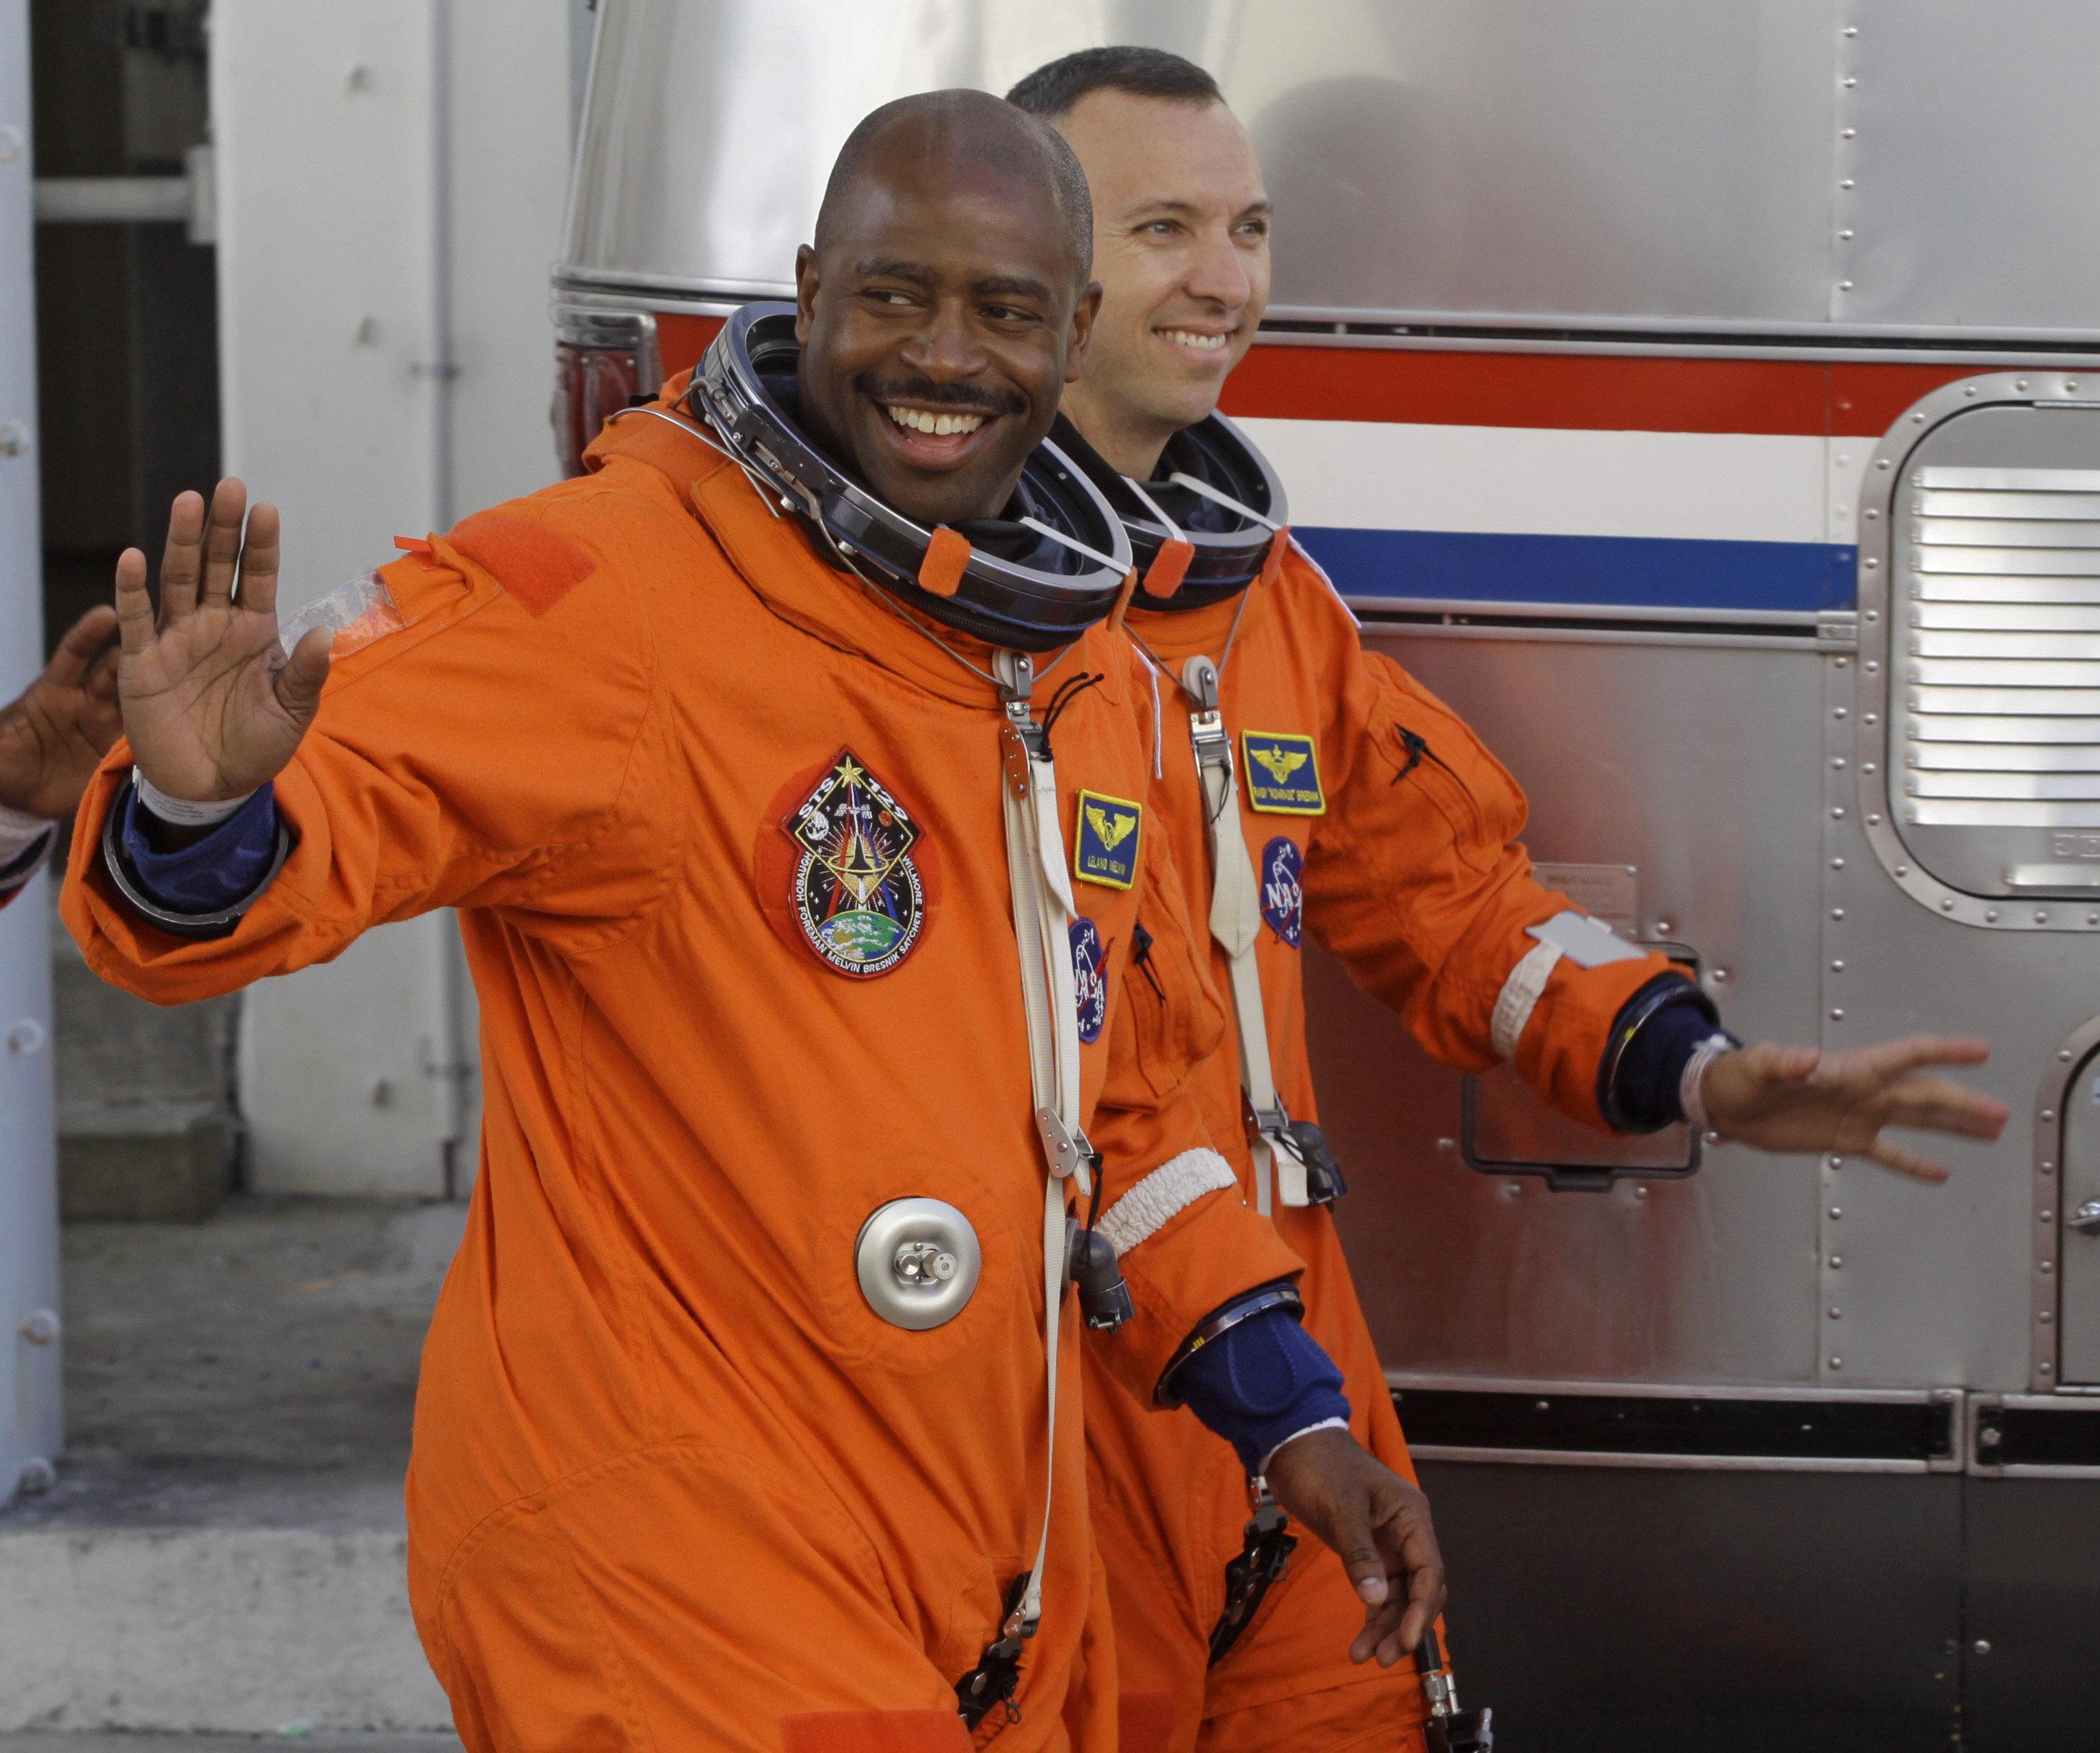 Leland Melvin, exastronauta de la NASA (izda.) y Randy Bresnik, astronauta de la NASA (drcha.)